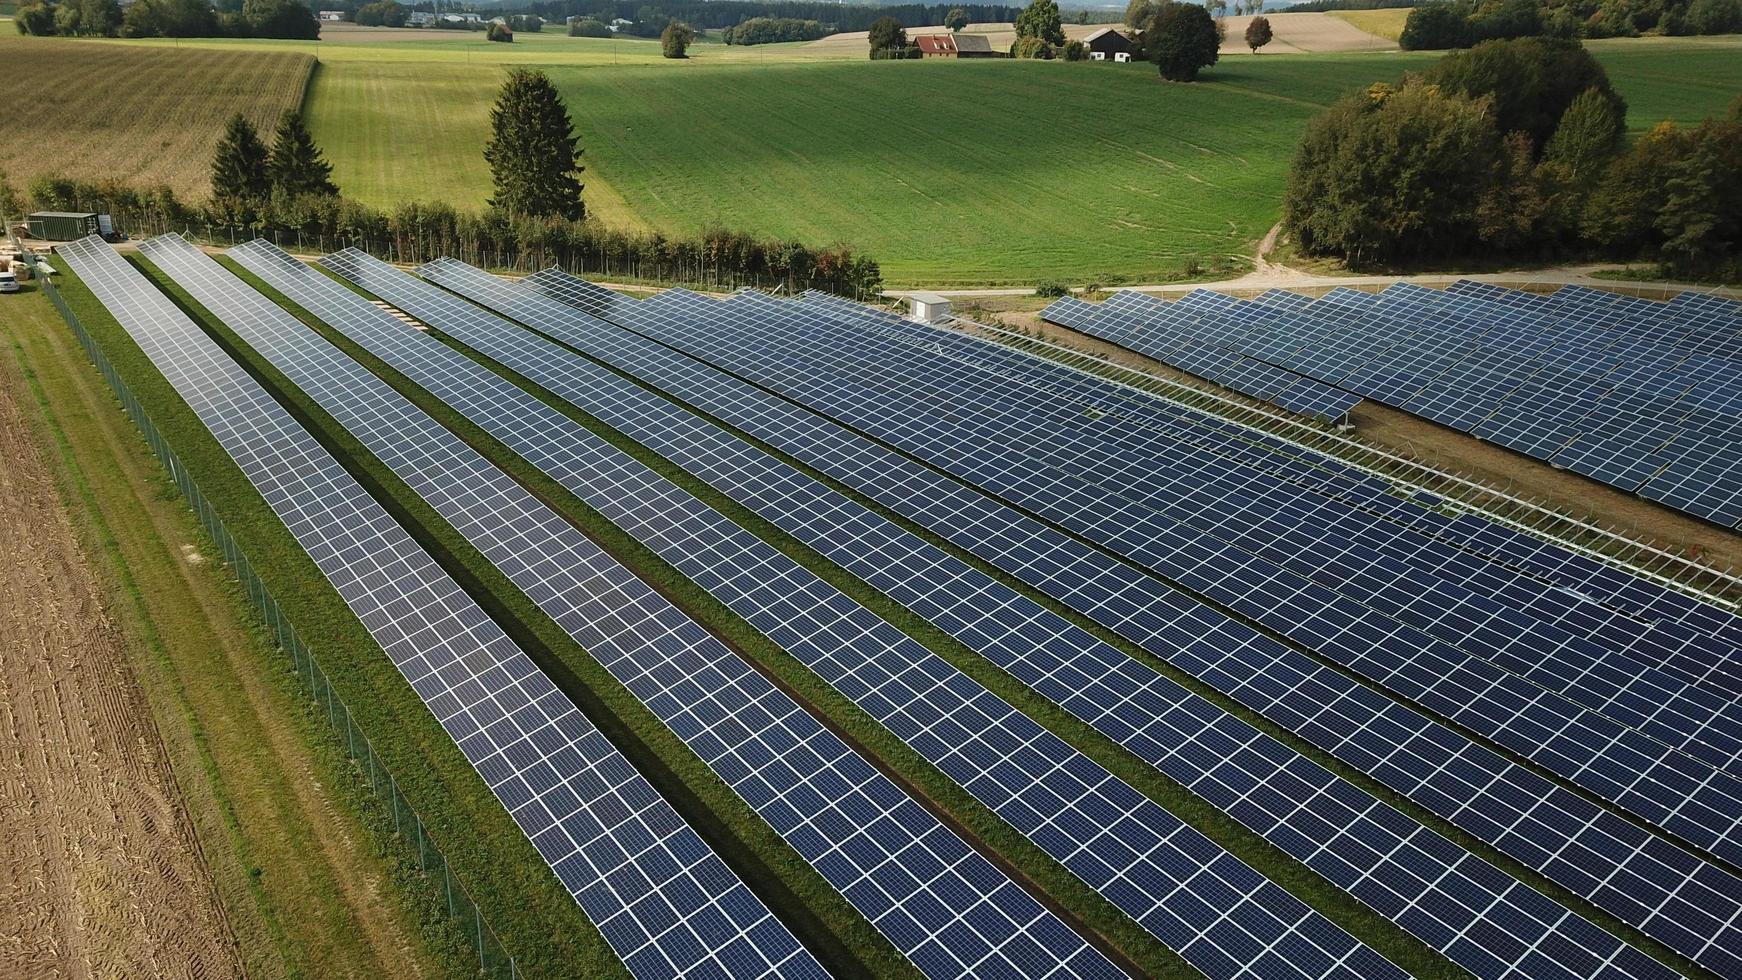 Solarenergiefeld foto